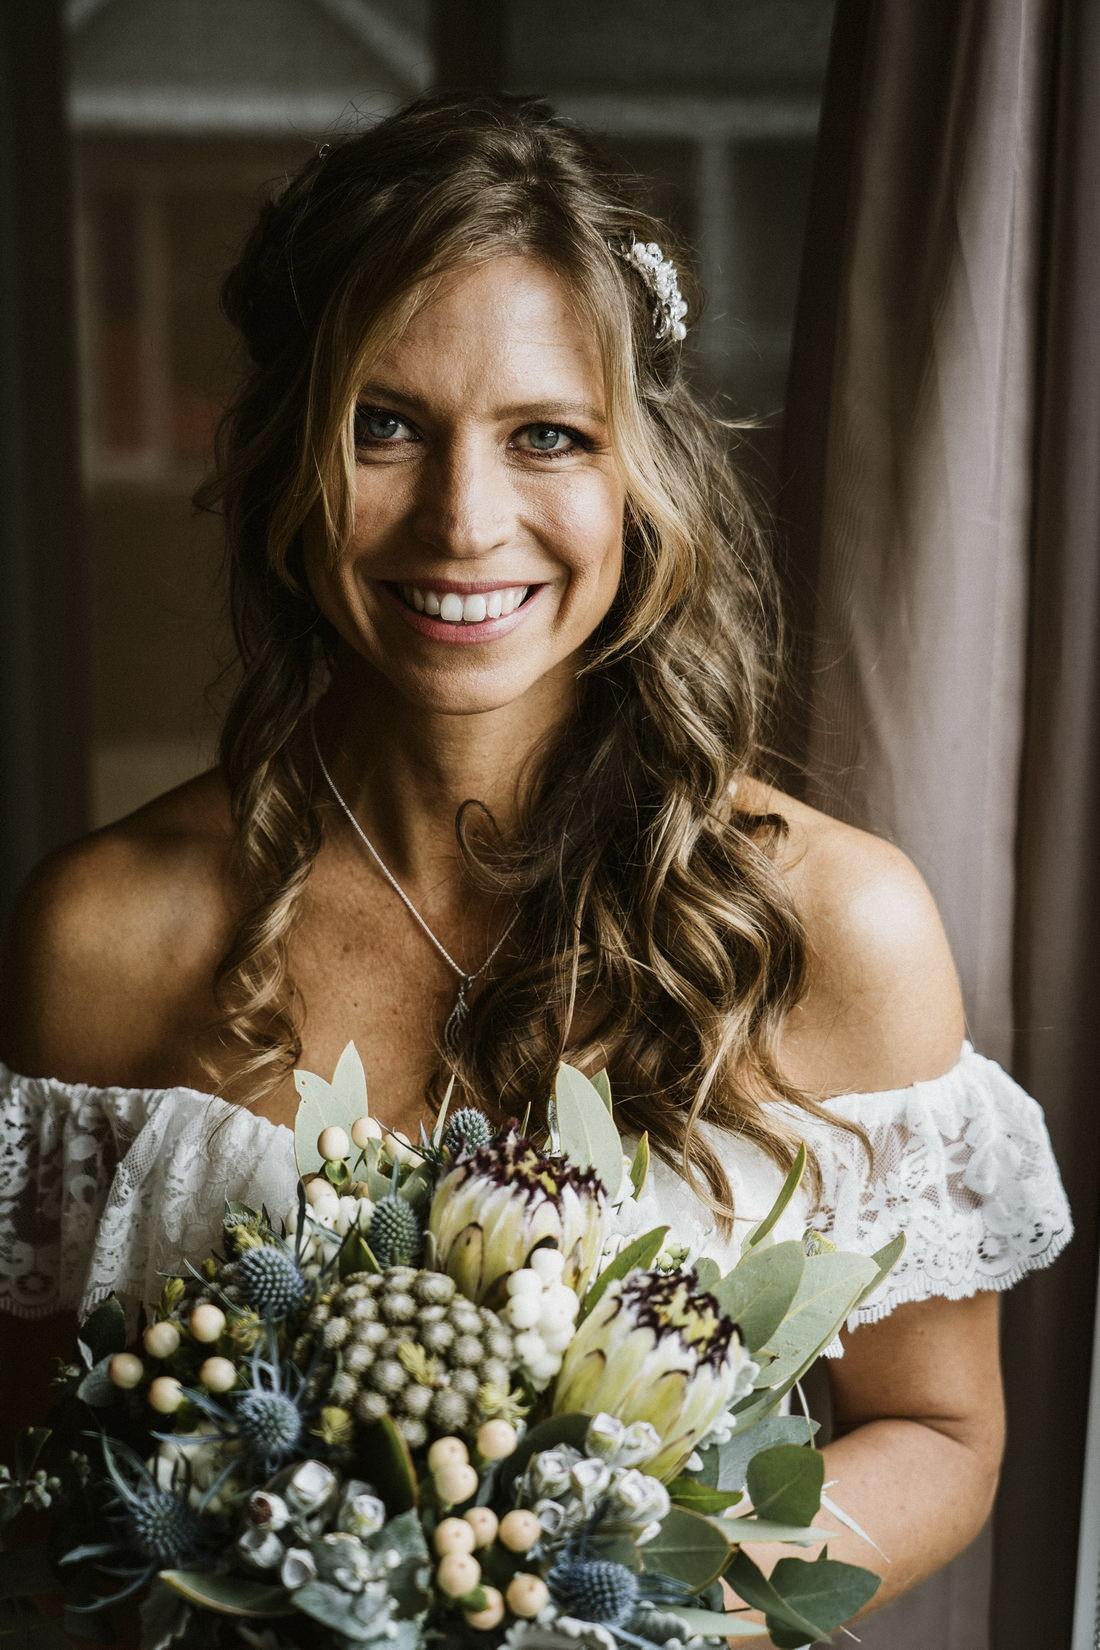 Smiling bride portrait by Bright Wedding Photographer